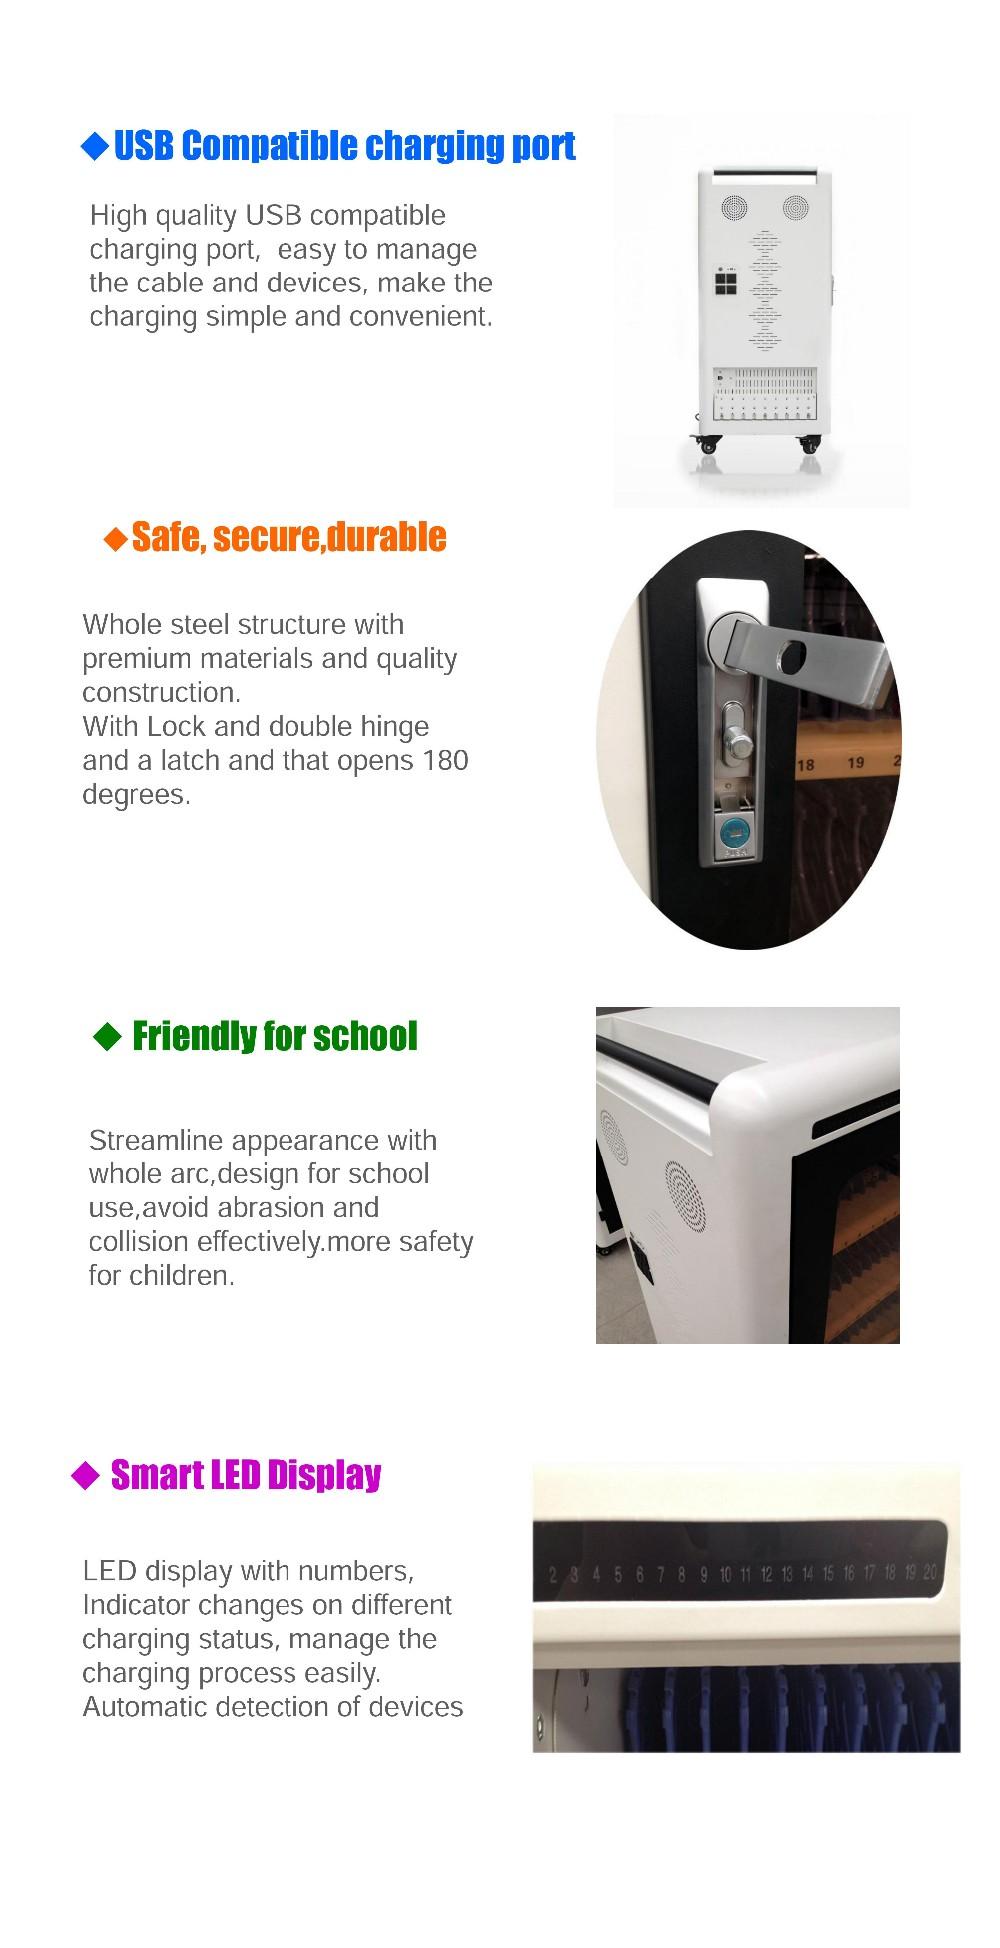 USB Tablet Carregamento cart SYNC & Charging cart chaging gabinete estação de carregamento